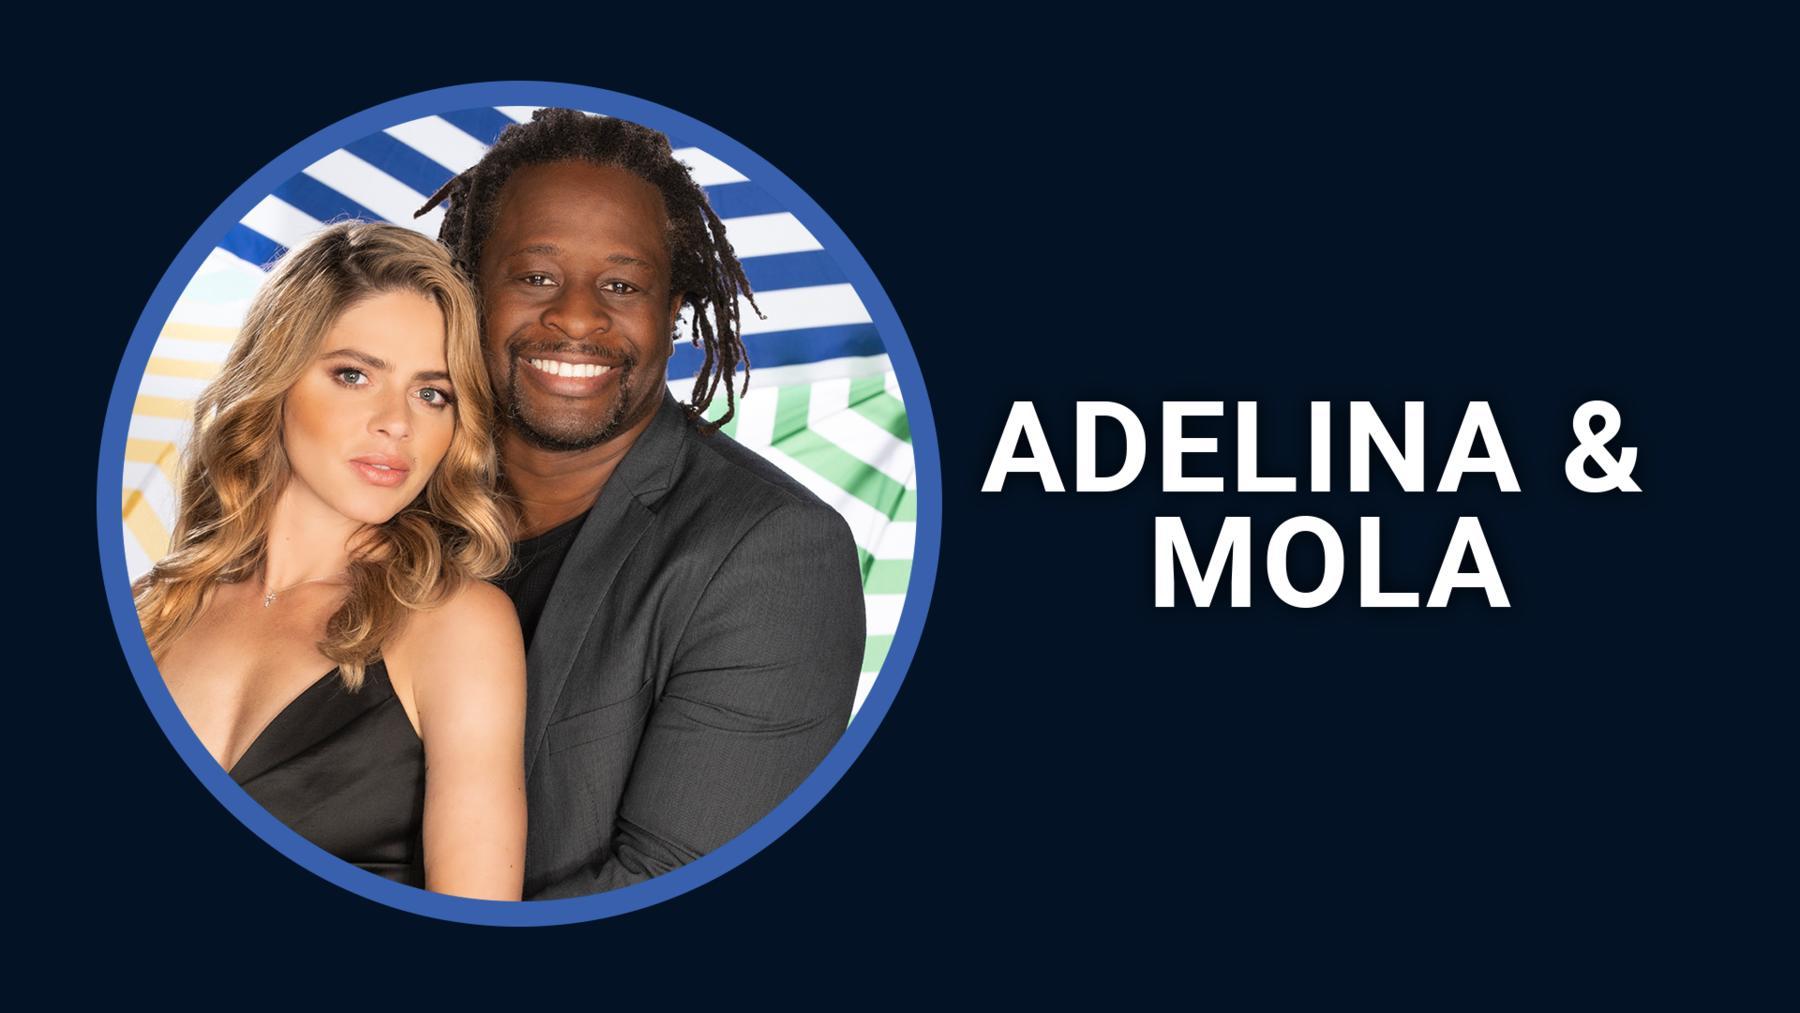 Adelina & Mola